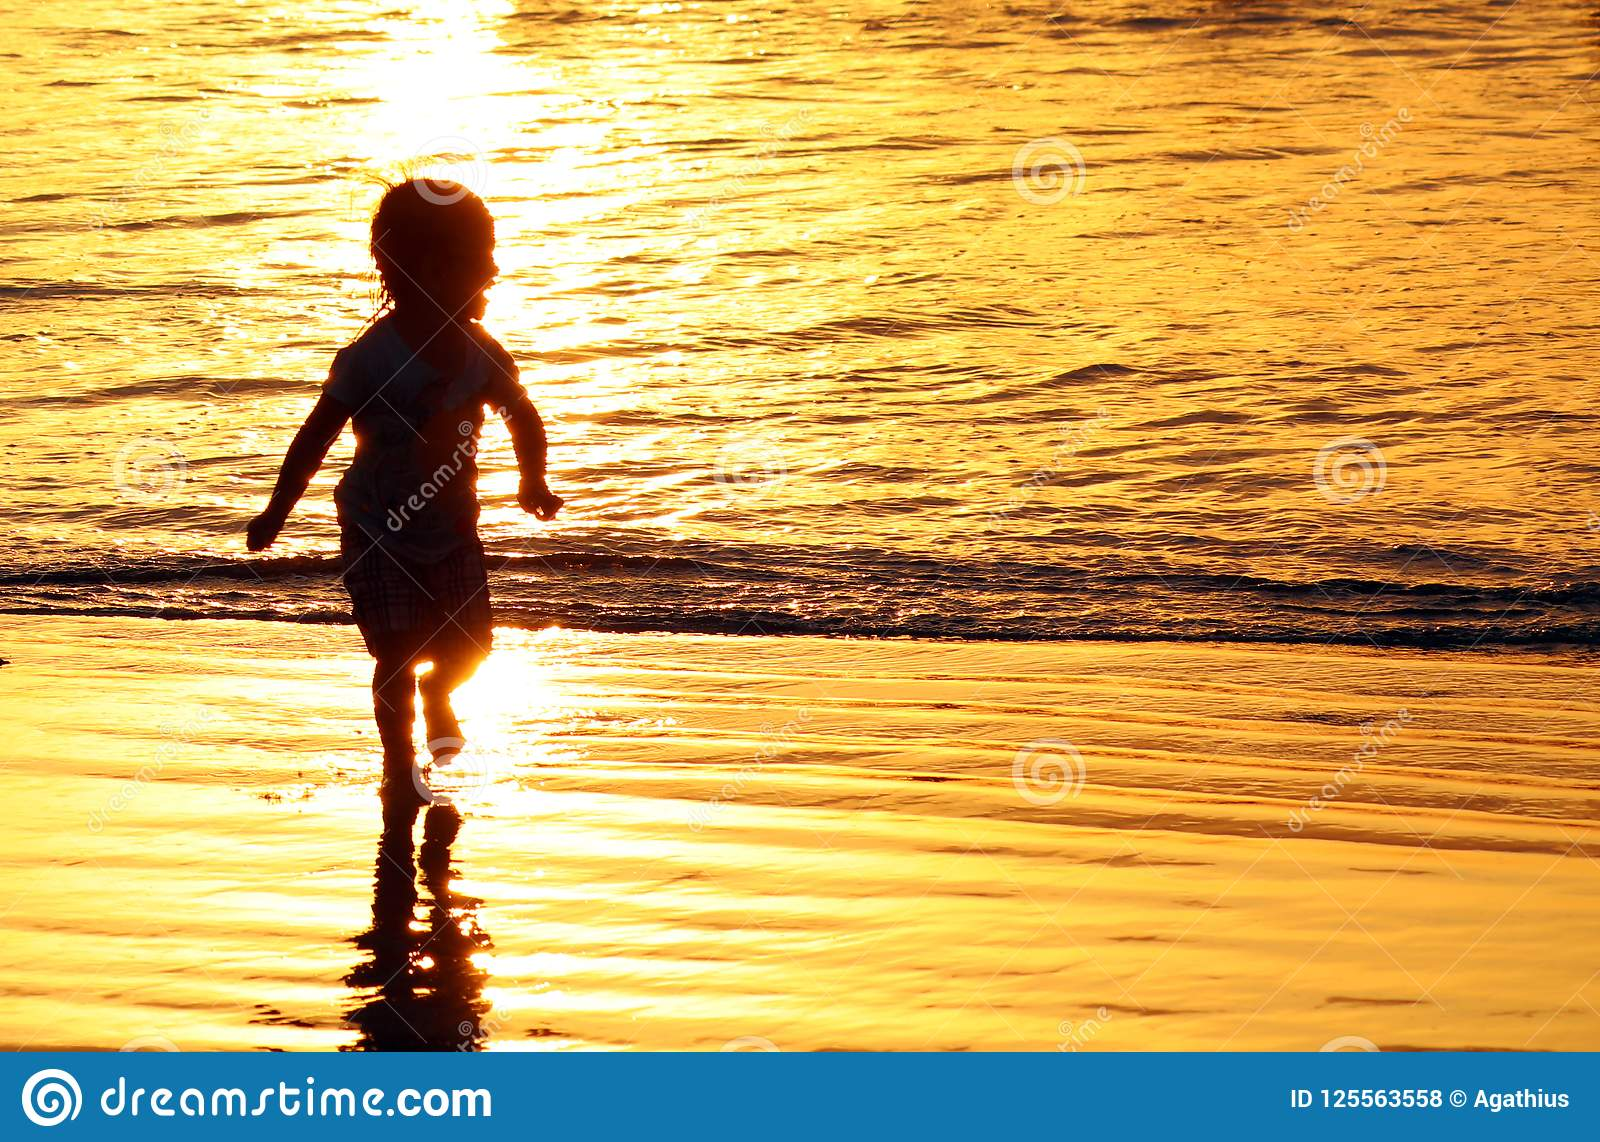 Дети играя на пляже в Бали, Индонезии во время золотого захода солнца Океан любит золото